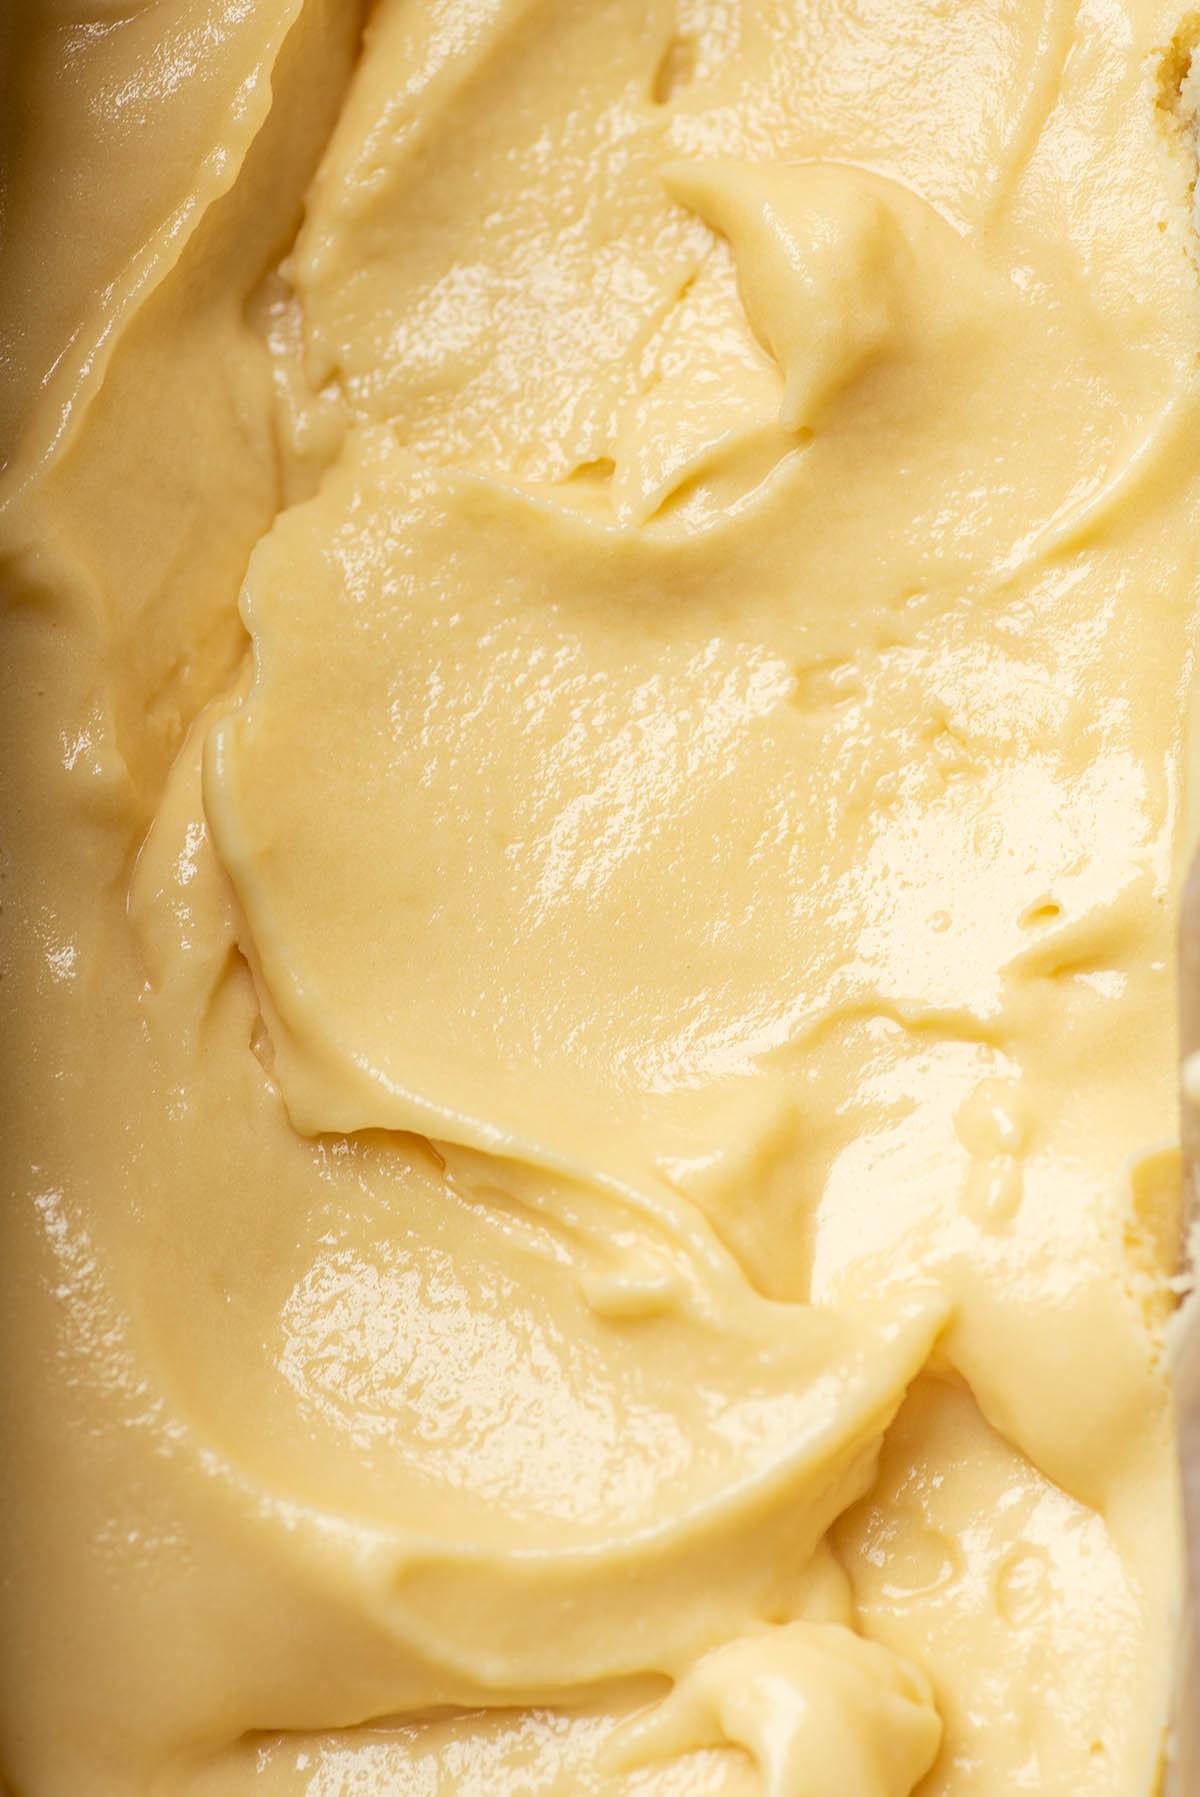 Close up of sweet cream ice cream.